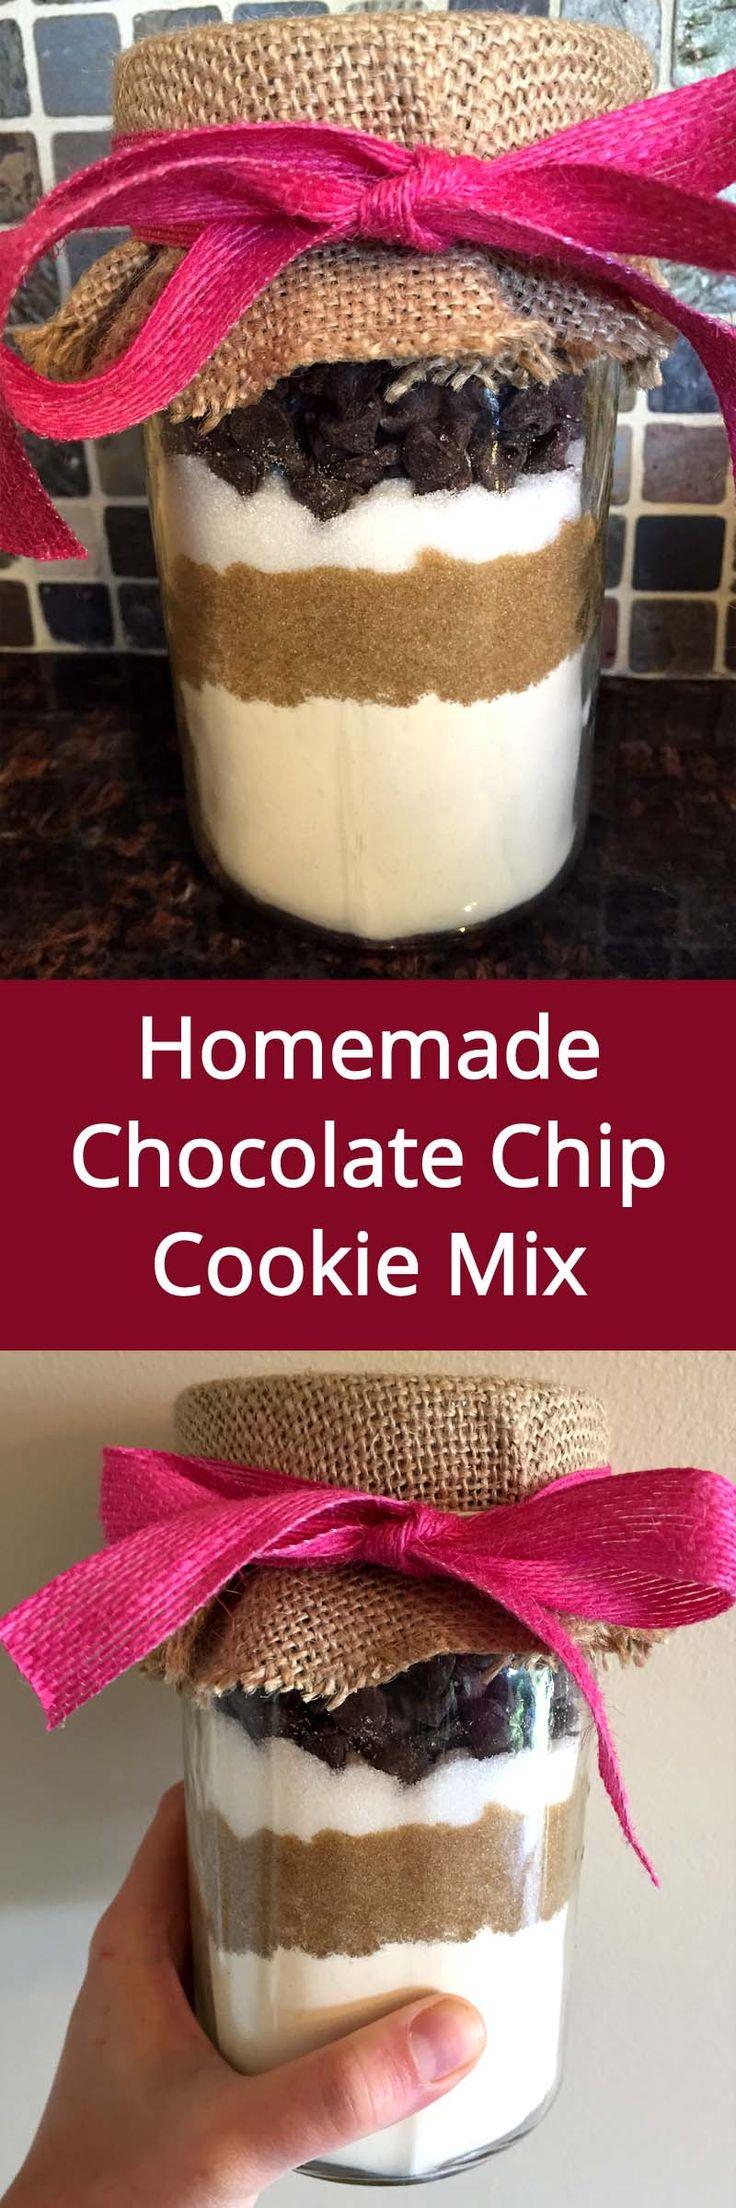 DYI Chocolate Chip Cookie Mix In A Mason JarMelanie Cooks